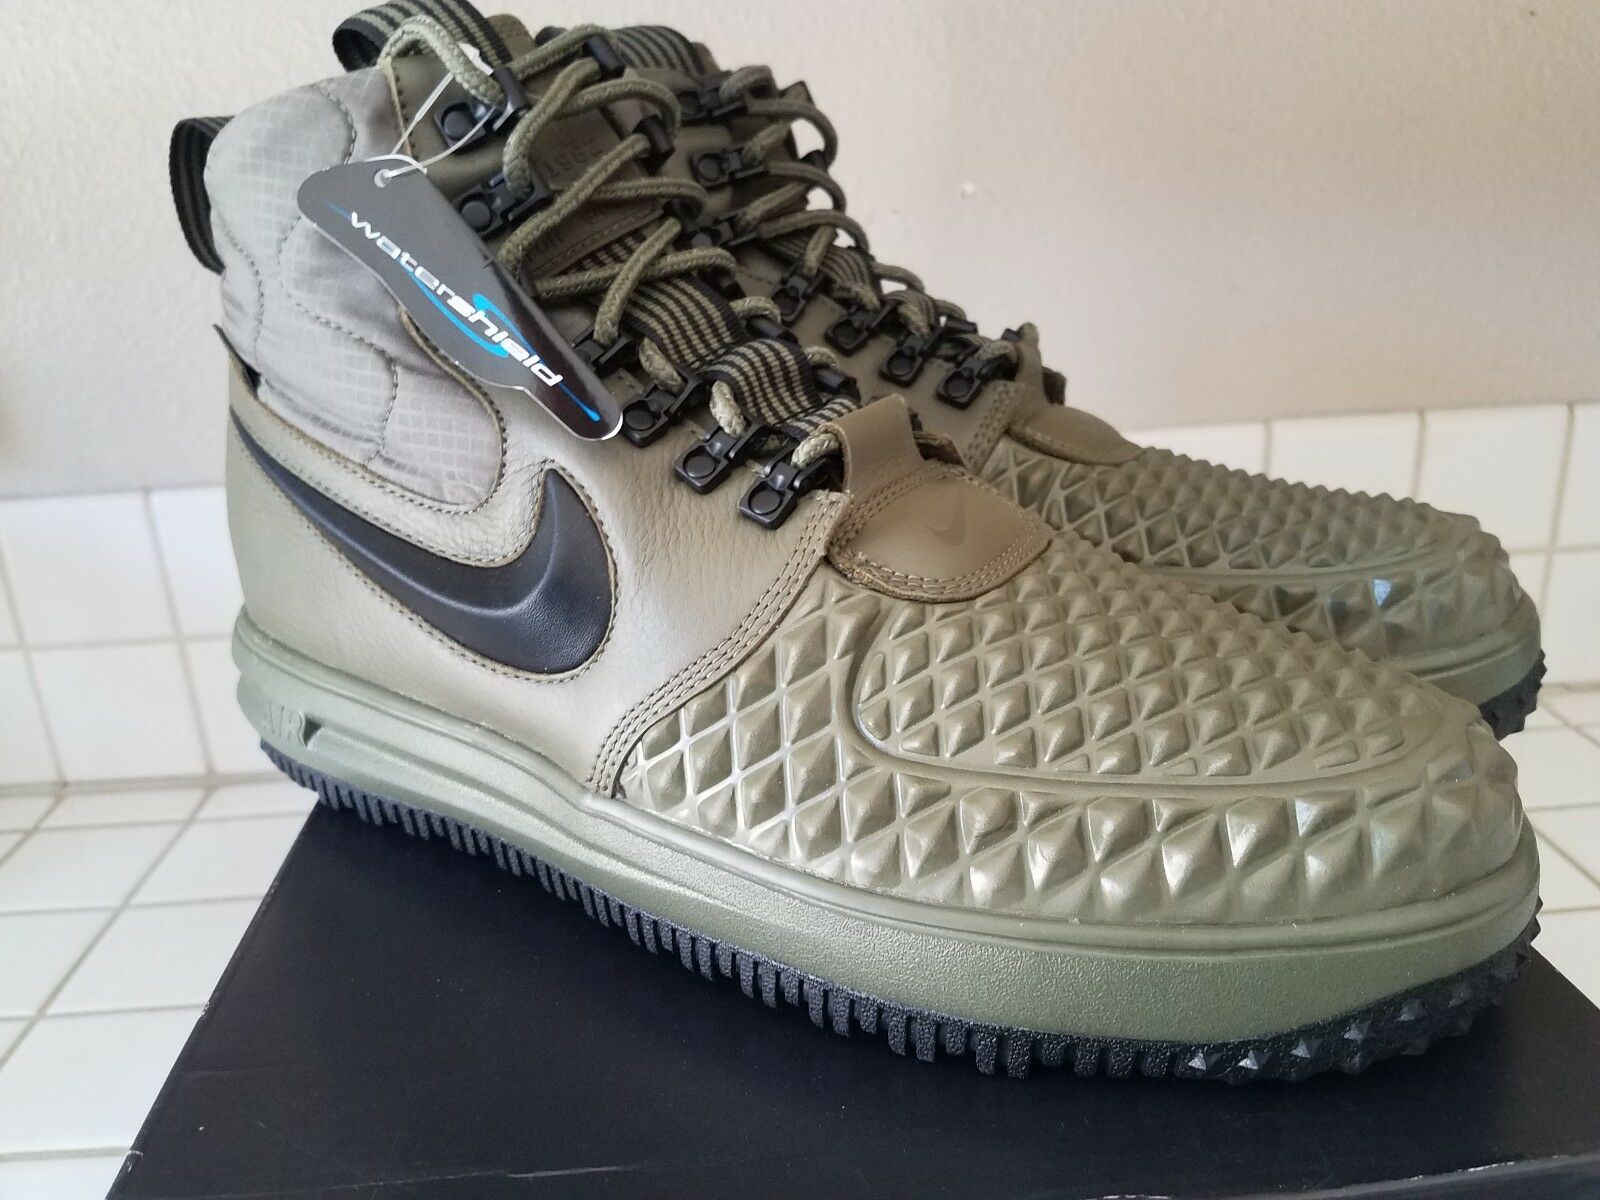 Nike LF1 Duckboot 17 Medium Olive Green Black Wolf Grey SZ 11.5 (916682-202)